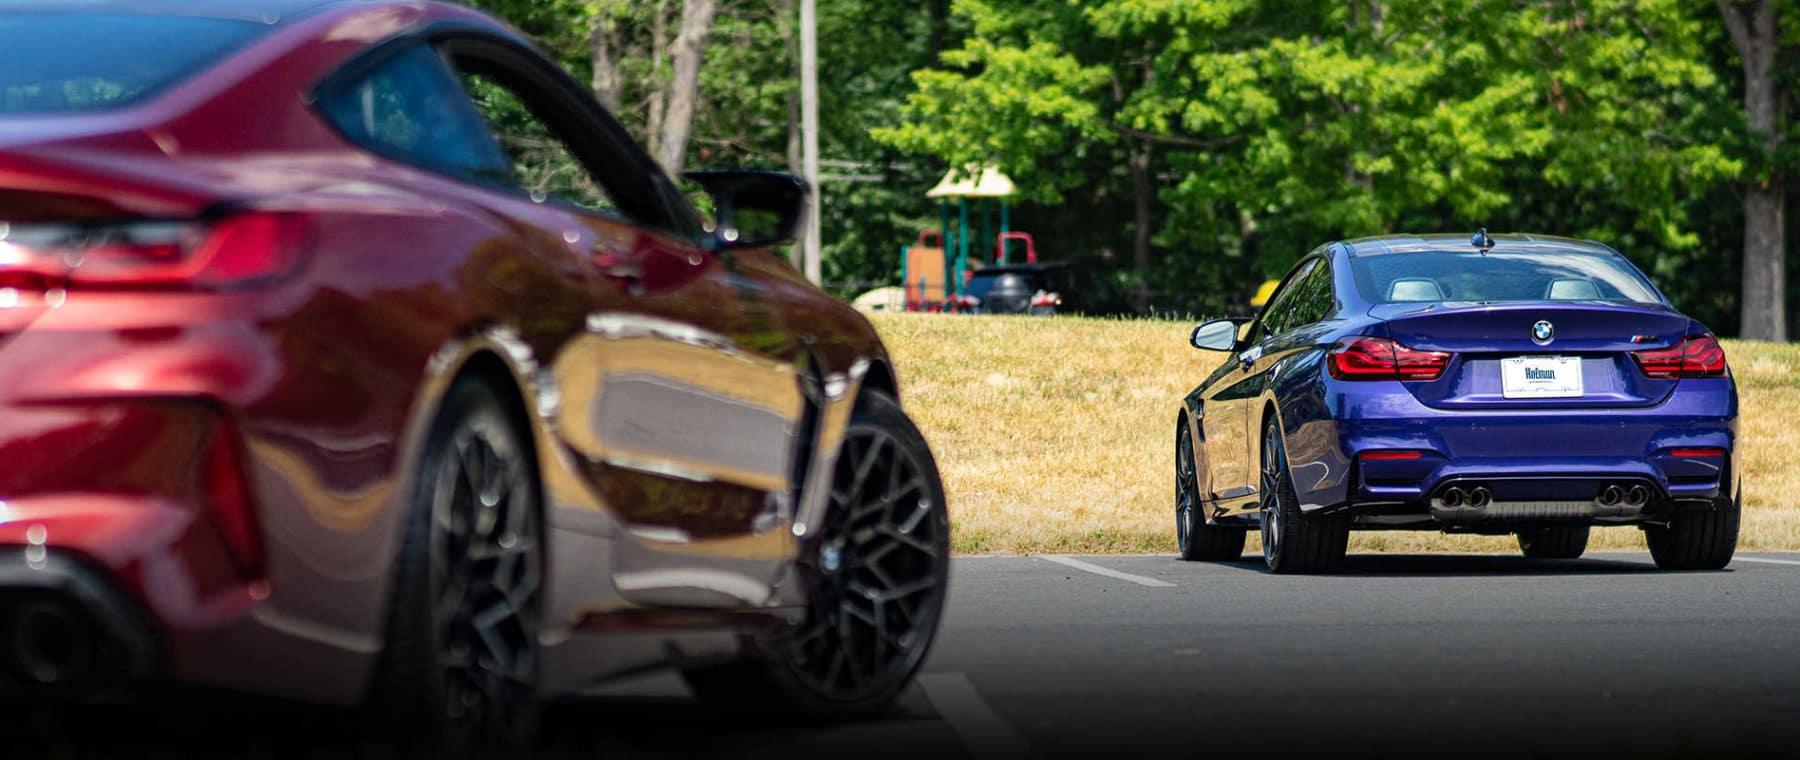 BMWML-May21-Homepage-HeroImage-800×1903 resized